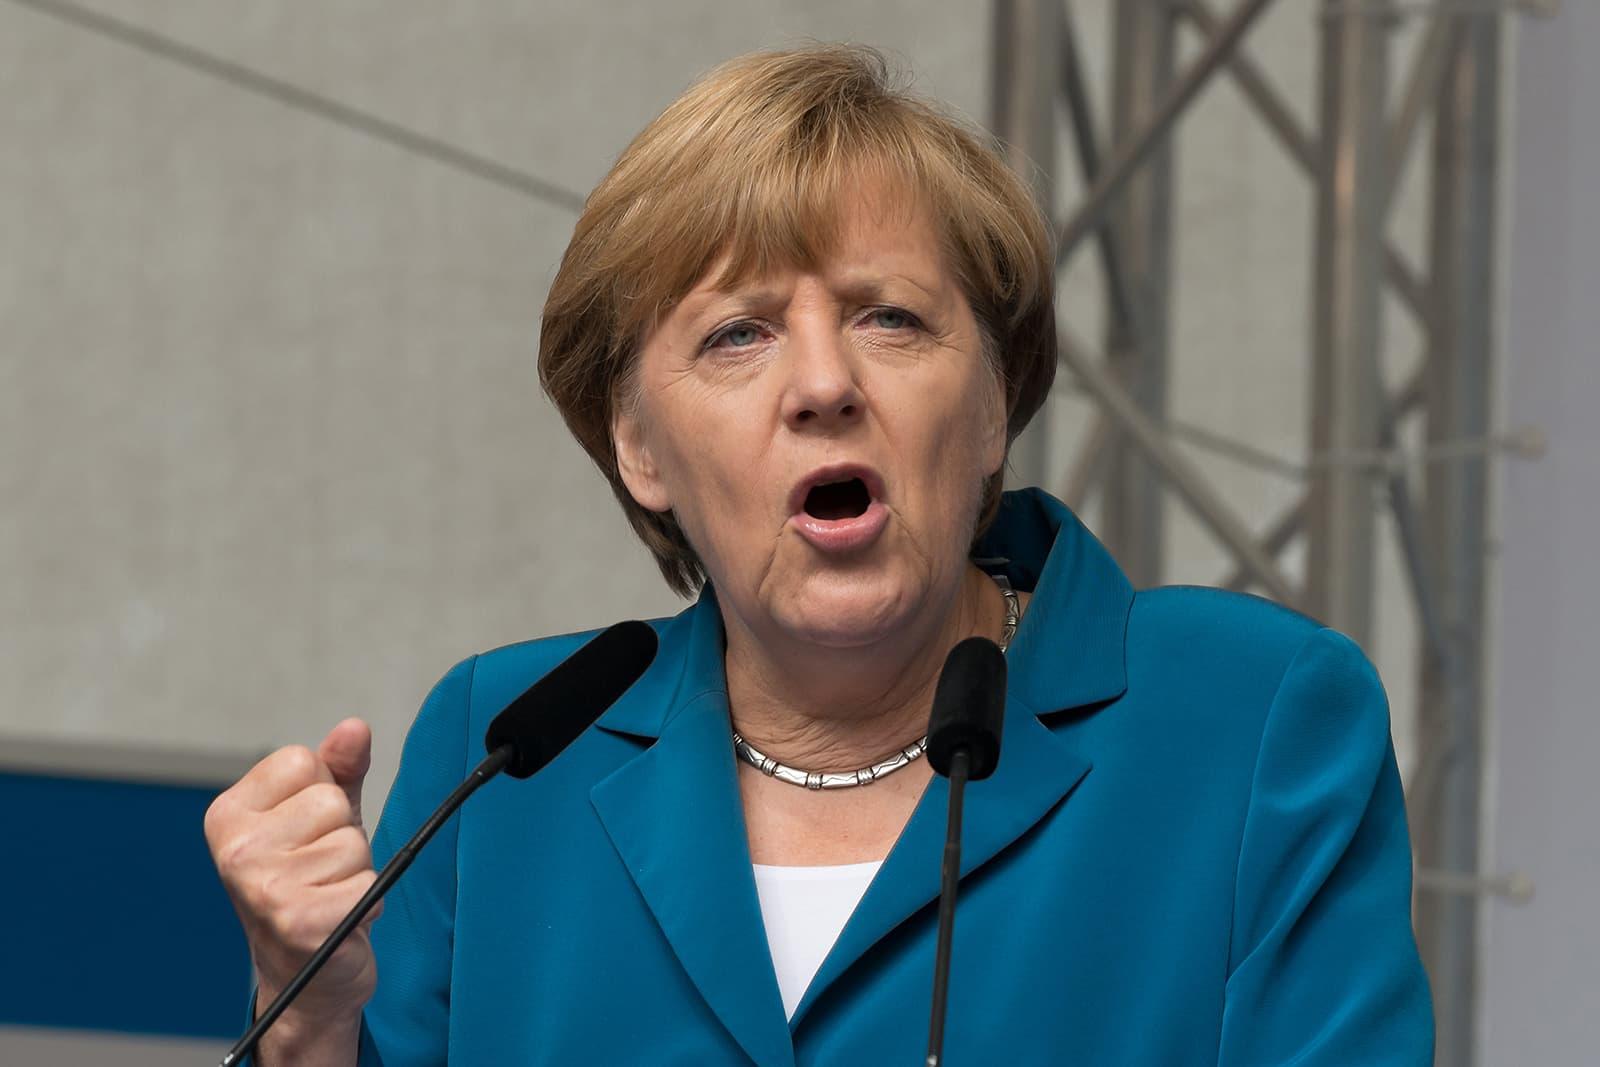 Angela Merkel affaire khashoggi